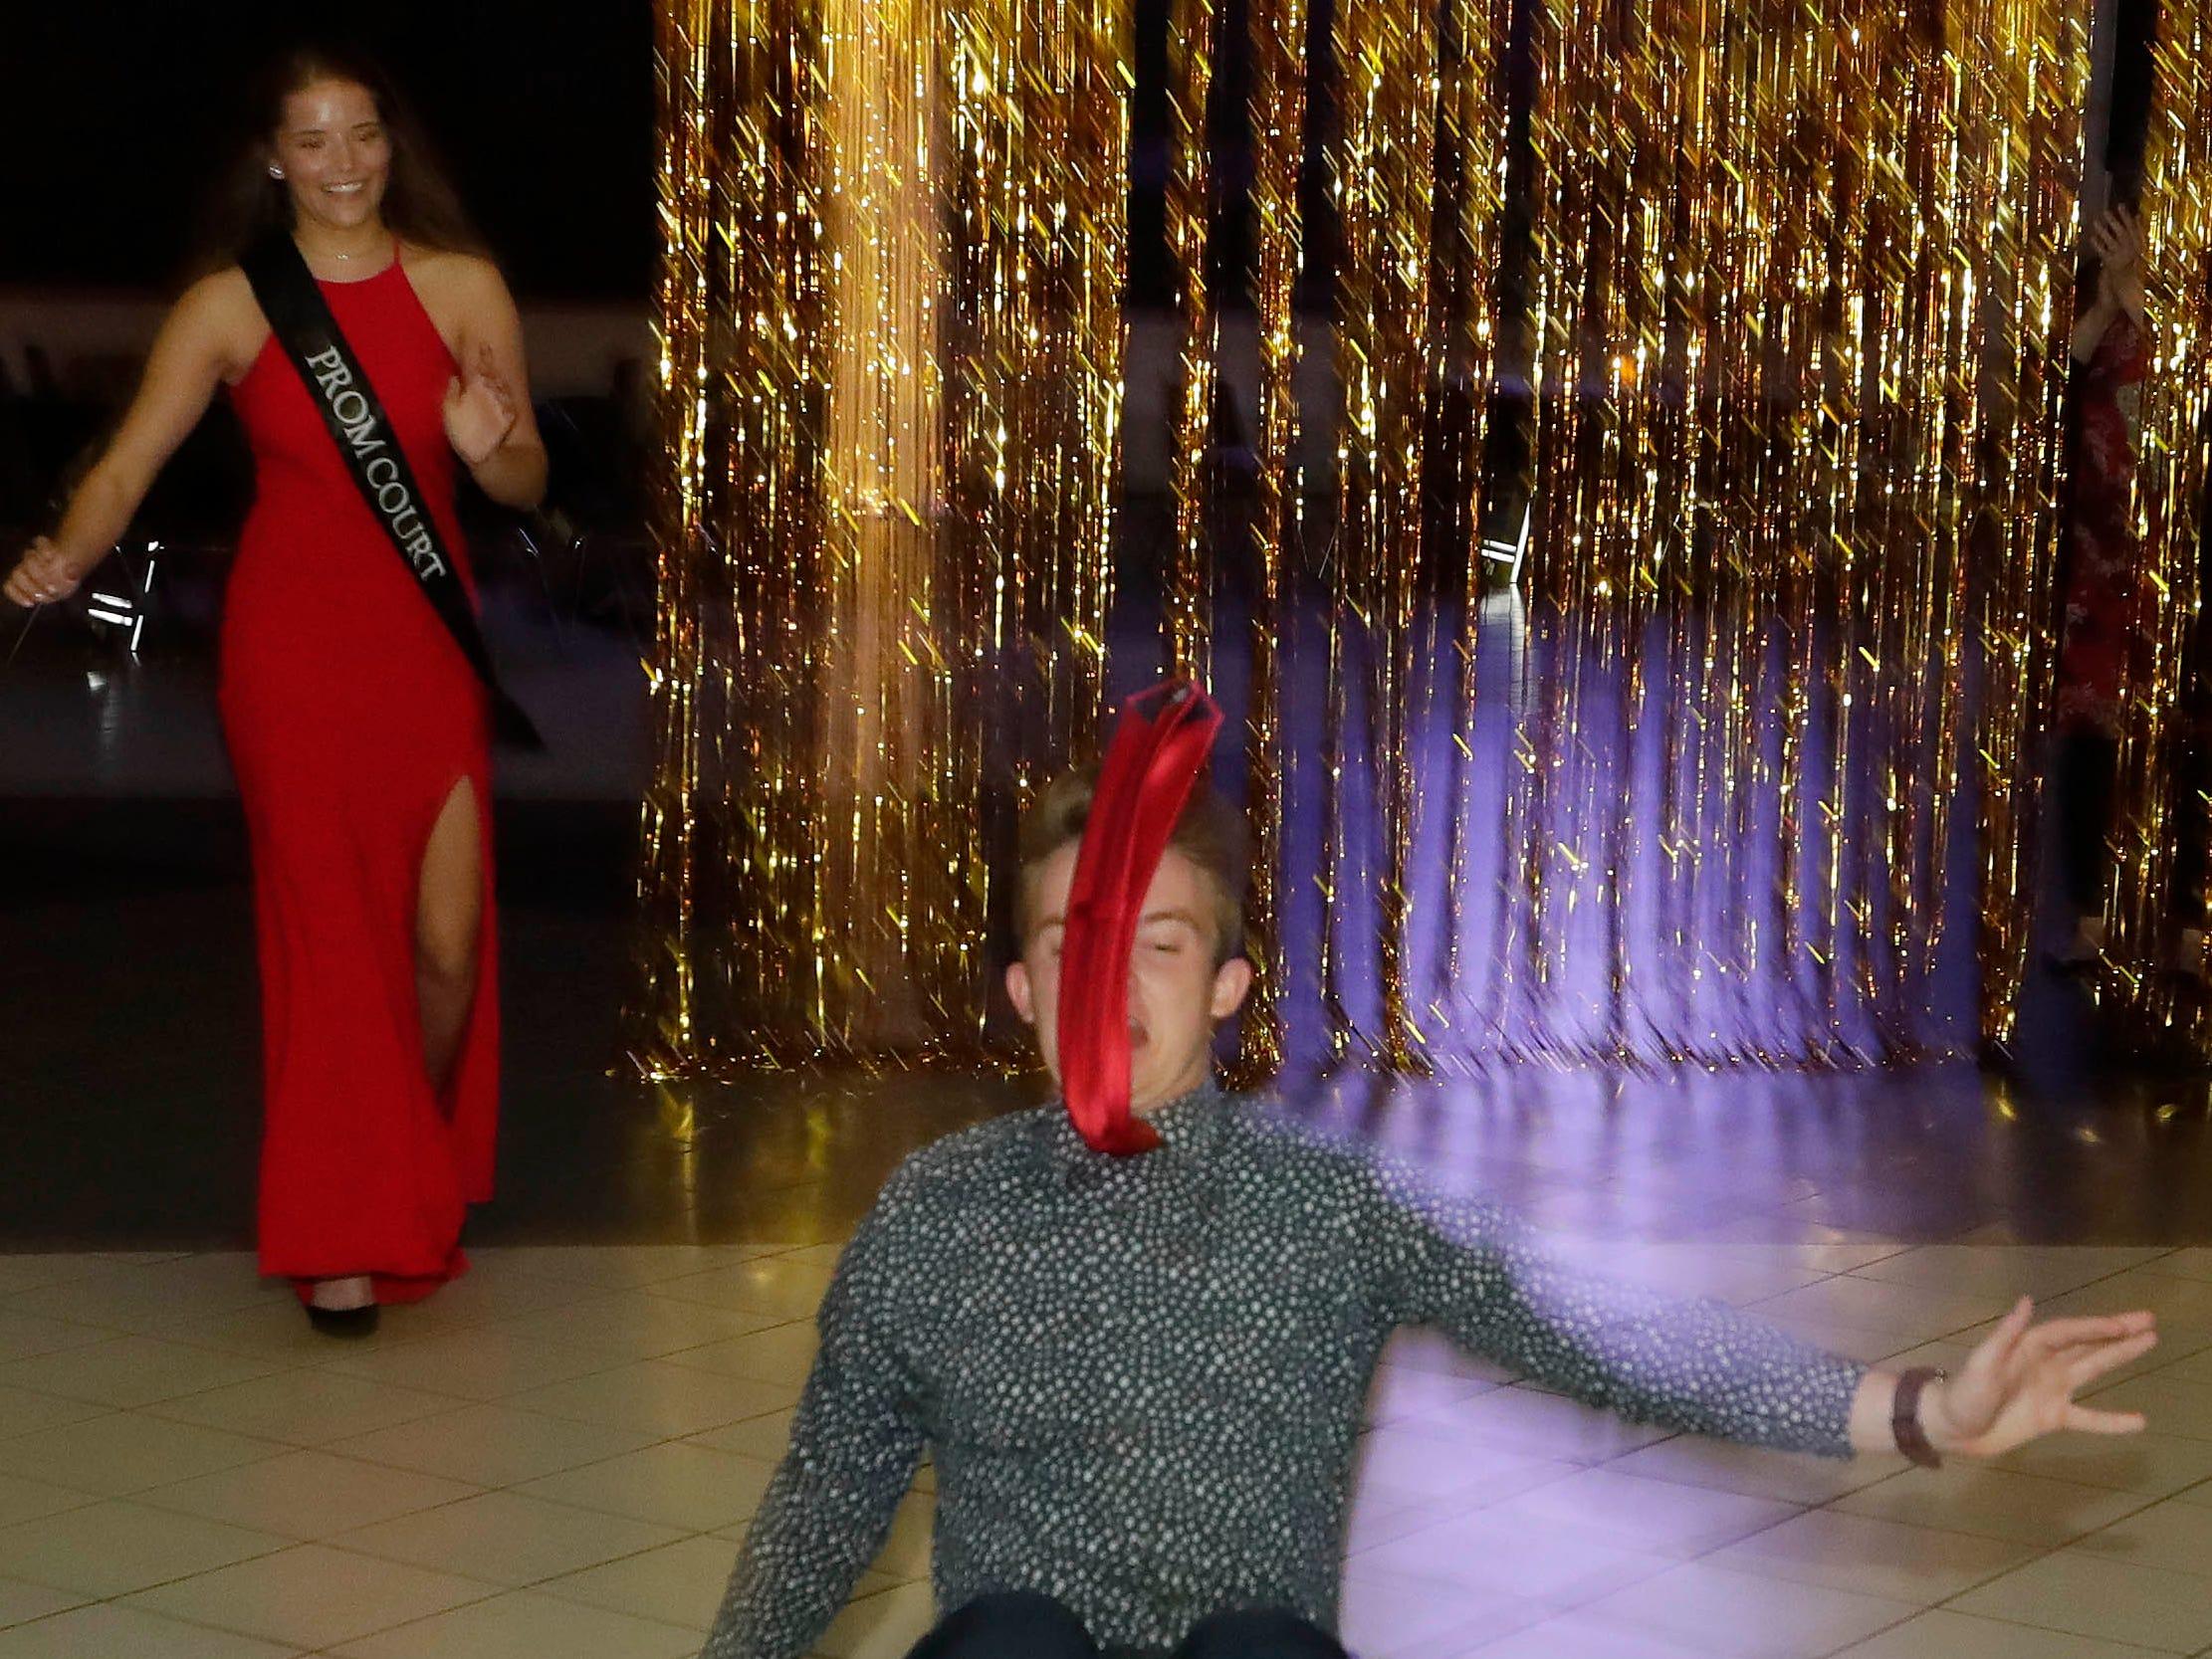 Scenes from the Sheboygan South Prom, Saturday, Mary 4, 2019, in Sheboygan, Wis.